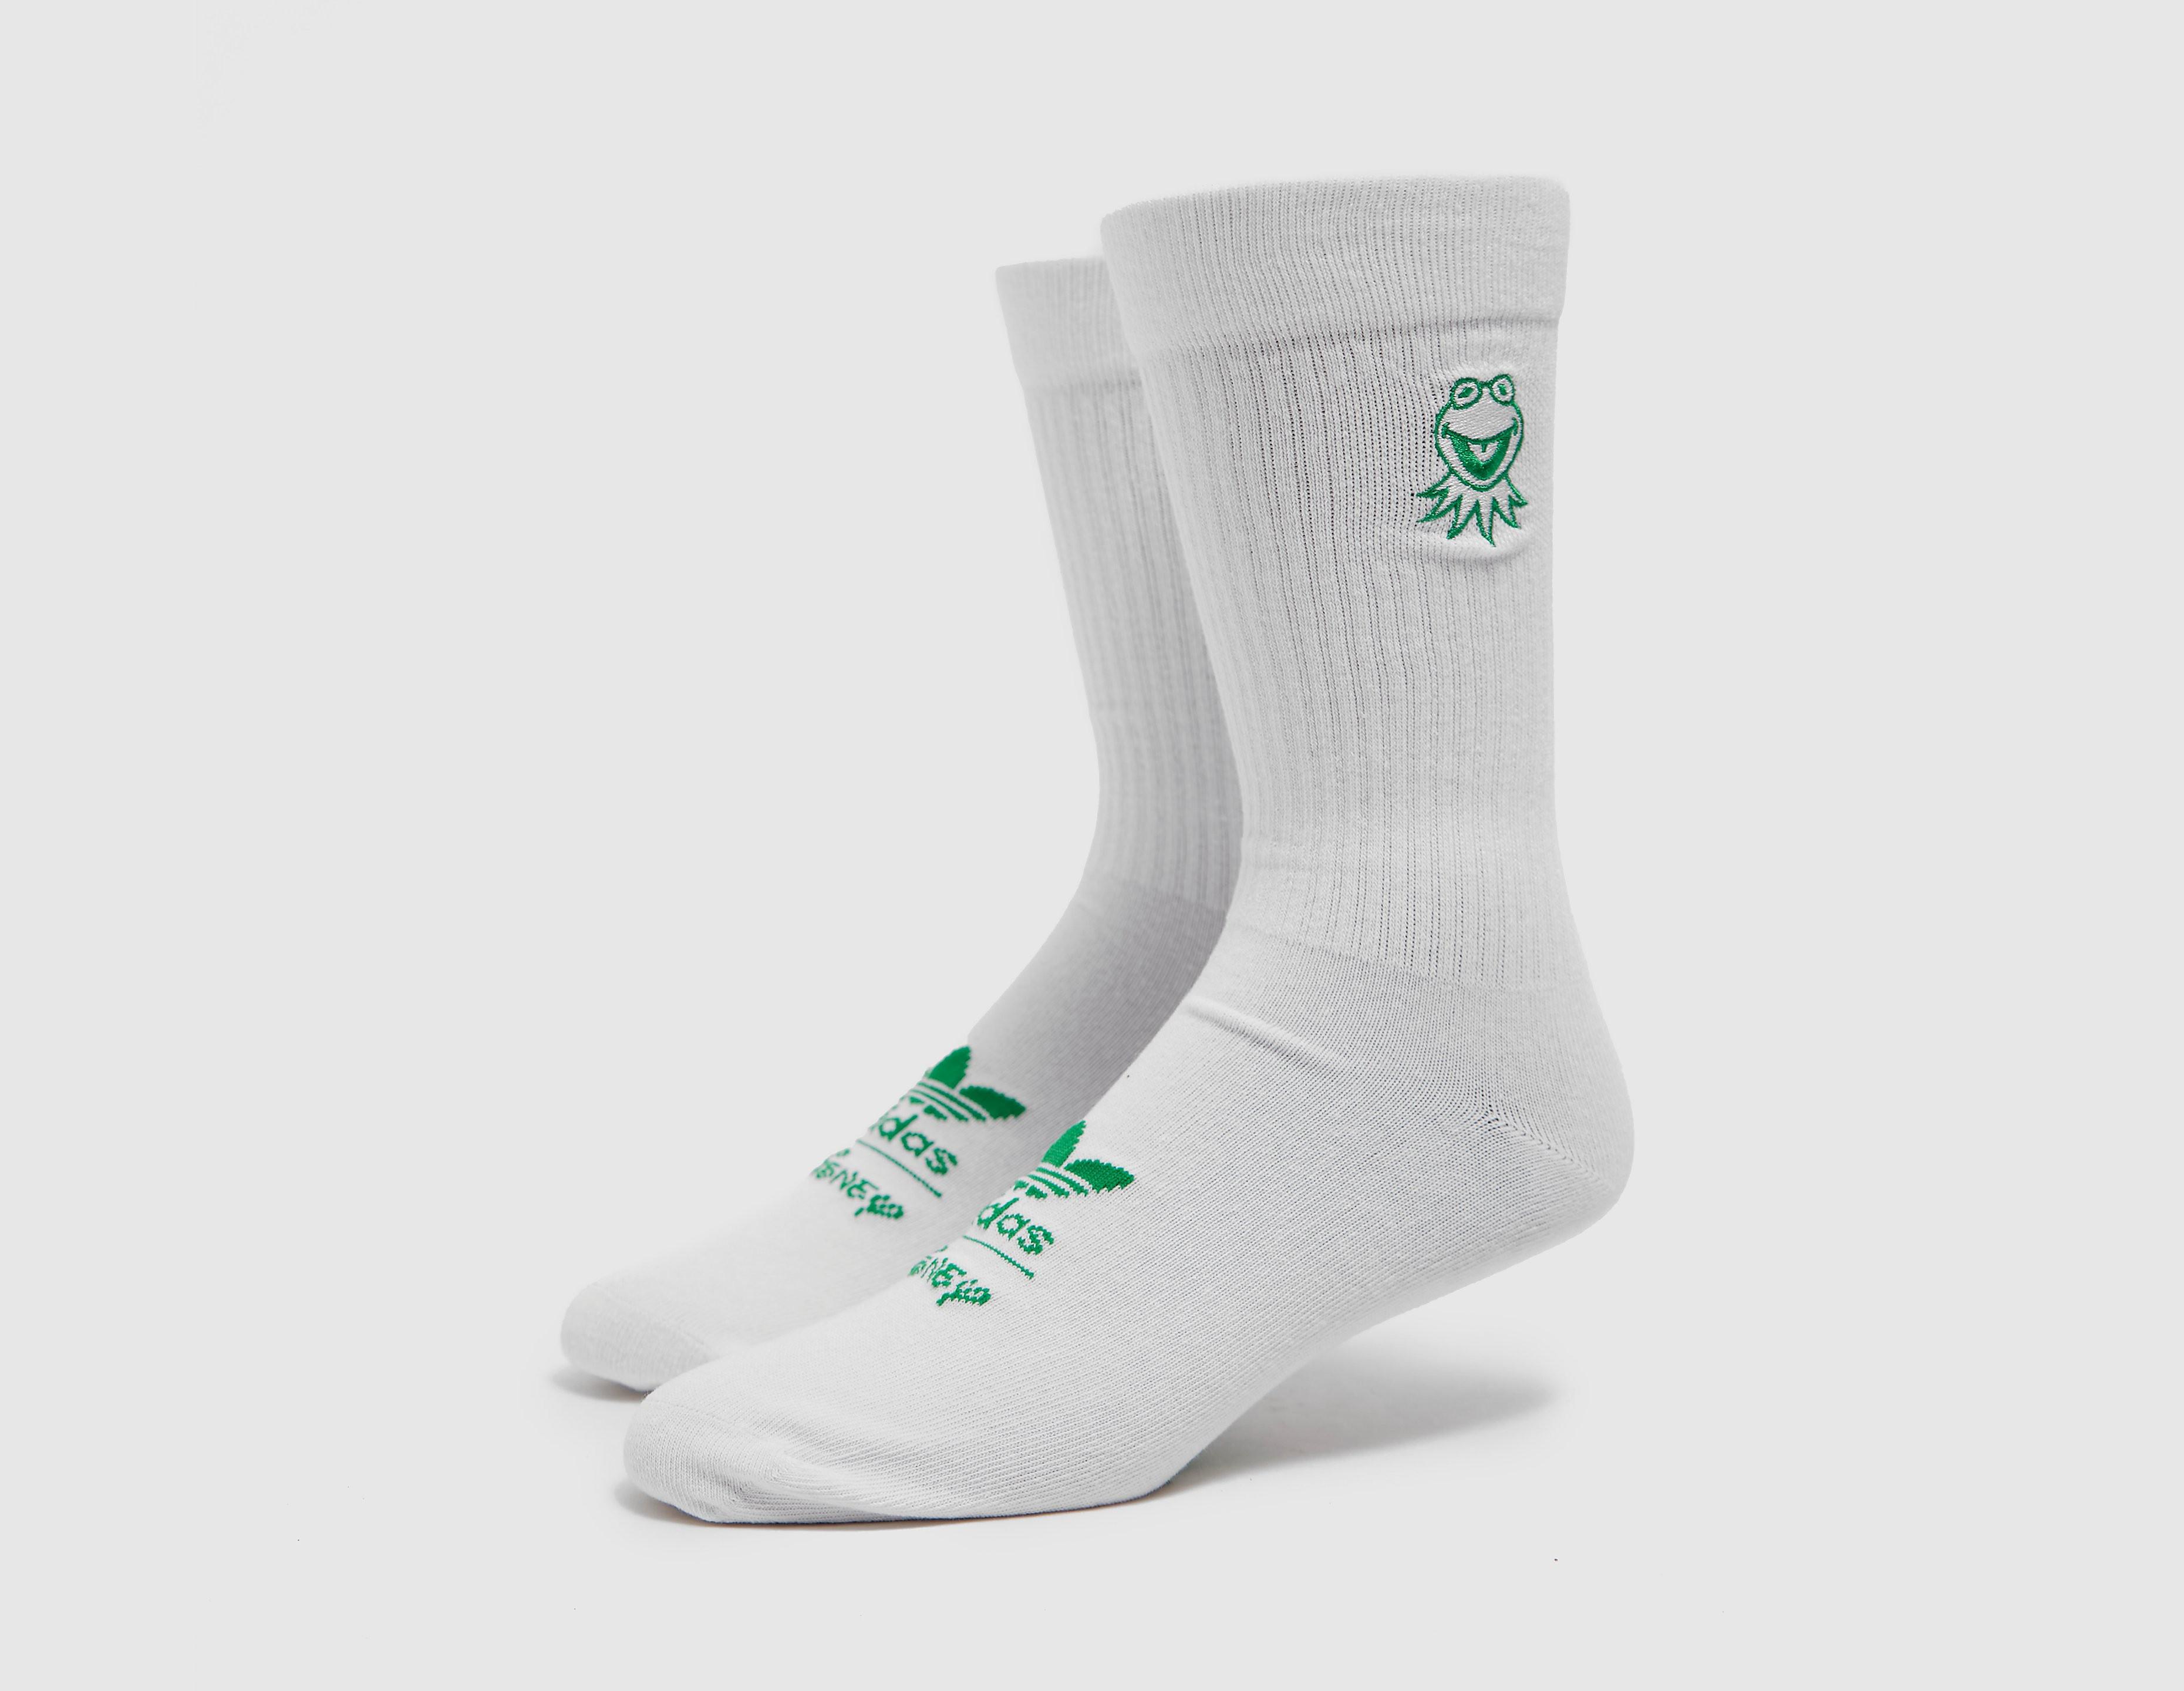 adidas Originals Kermit Sock